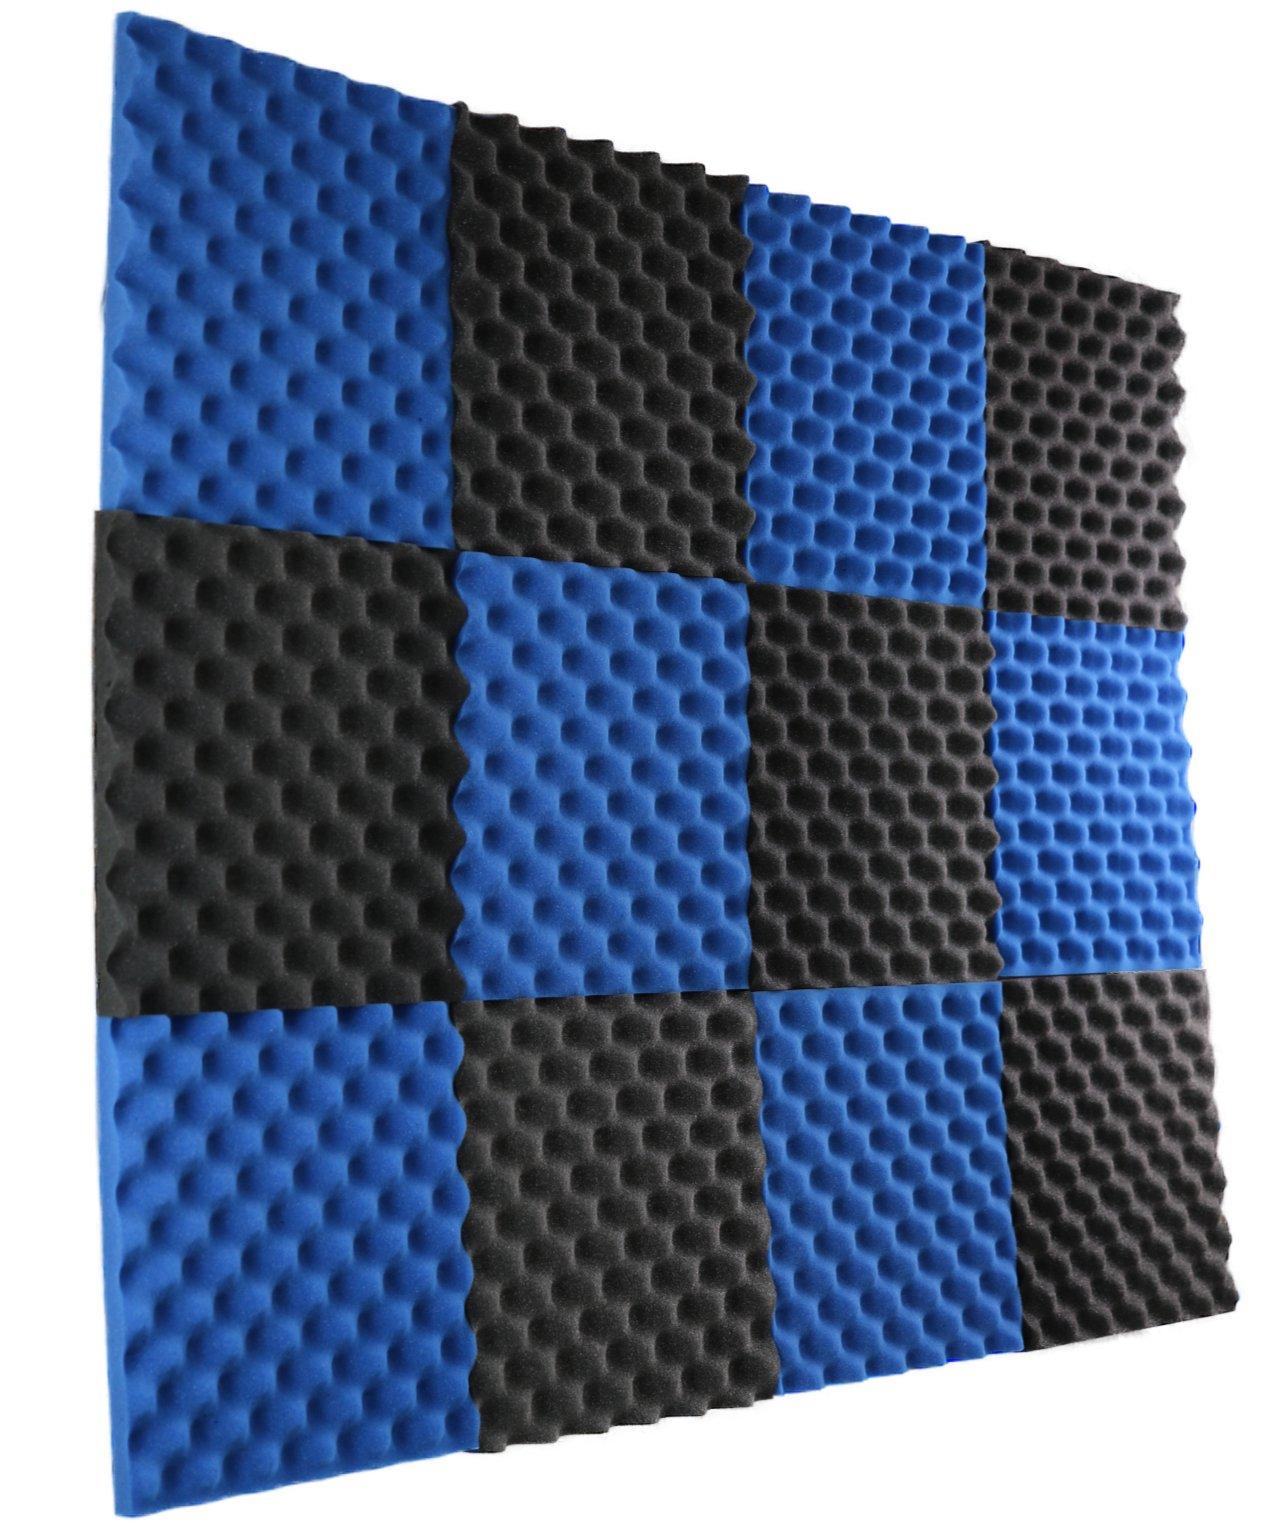 New Level 12 Pack- Ice Blue/Charcoal Acoustic Panels Studio Foam Egg Crate 1'' X 12'' X 12''